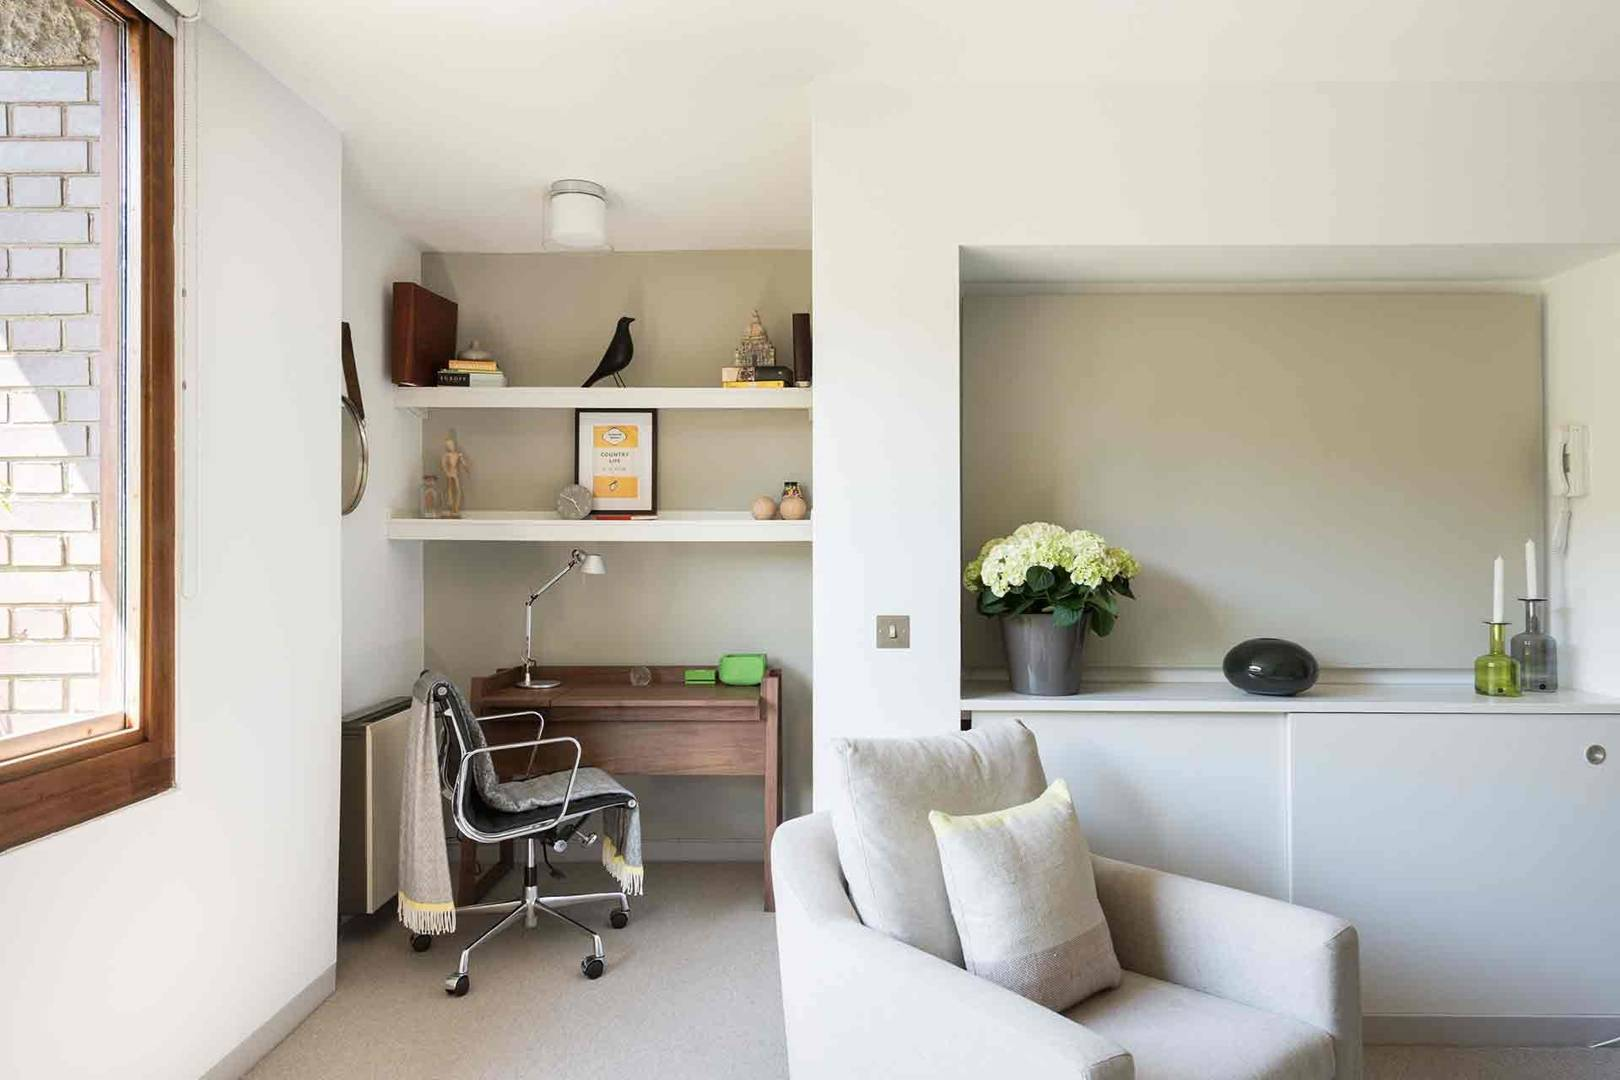 Modern Interiors U0026 Designs By The List Members   Interior Design Ideas    House U0026 Garden